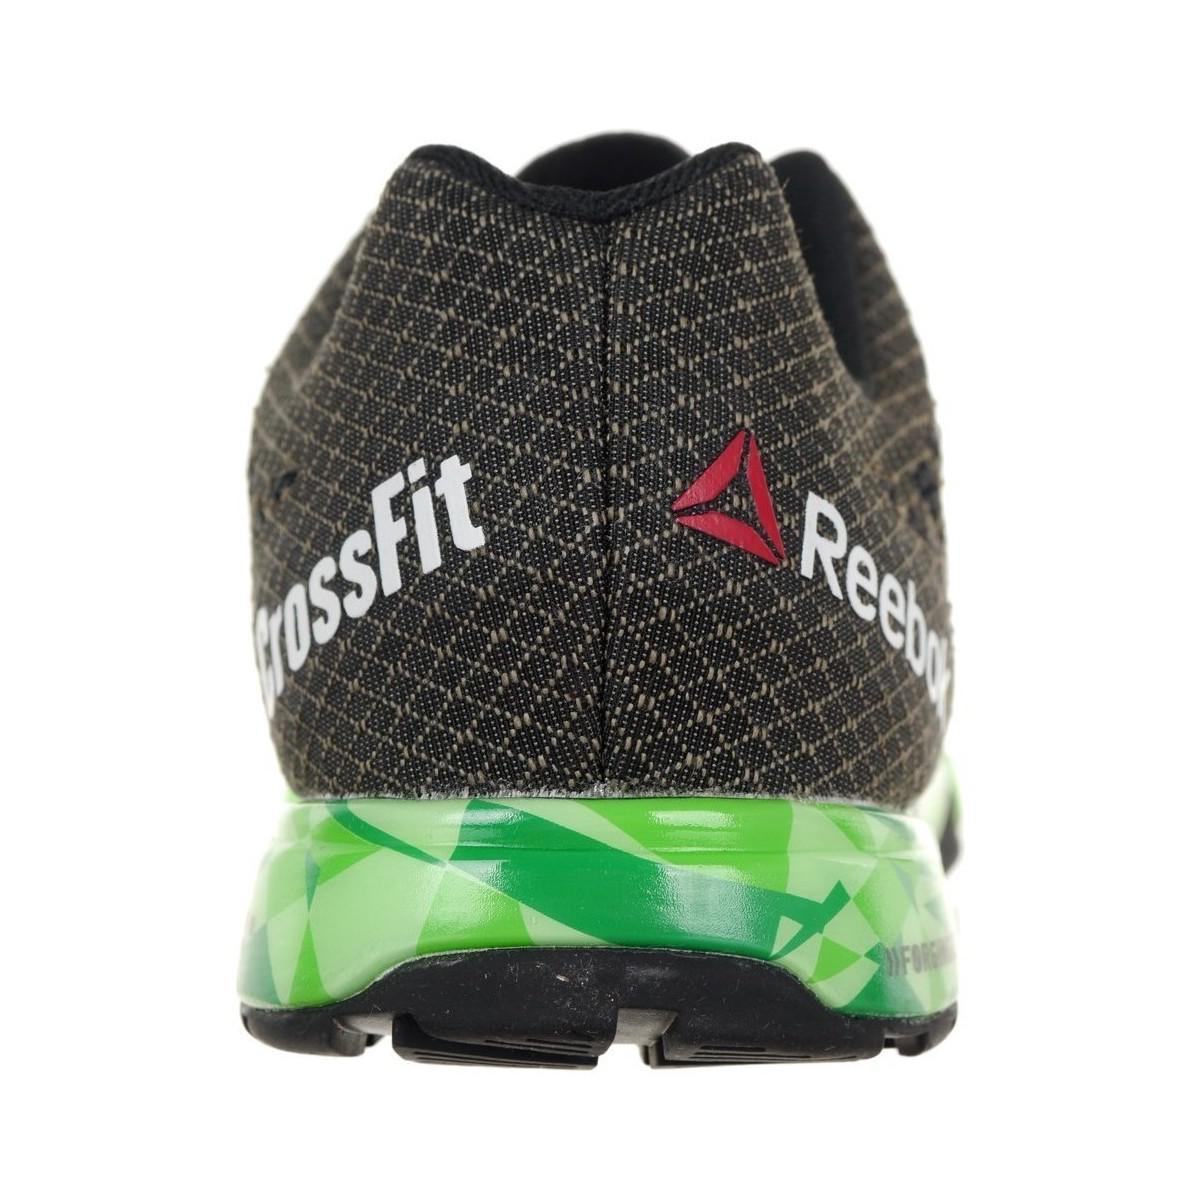 Reebok Crossfit Nano 50 Women's Running Trainers In Black